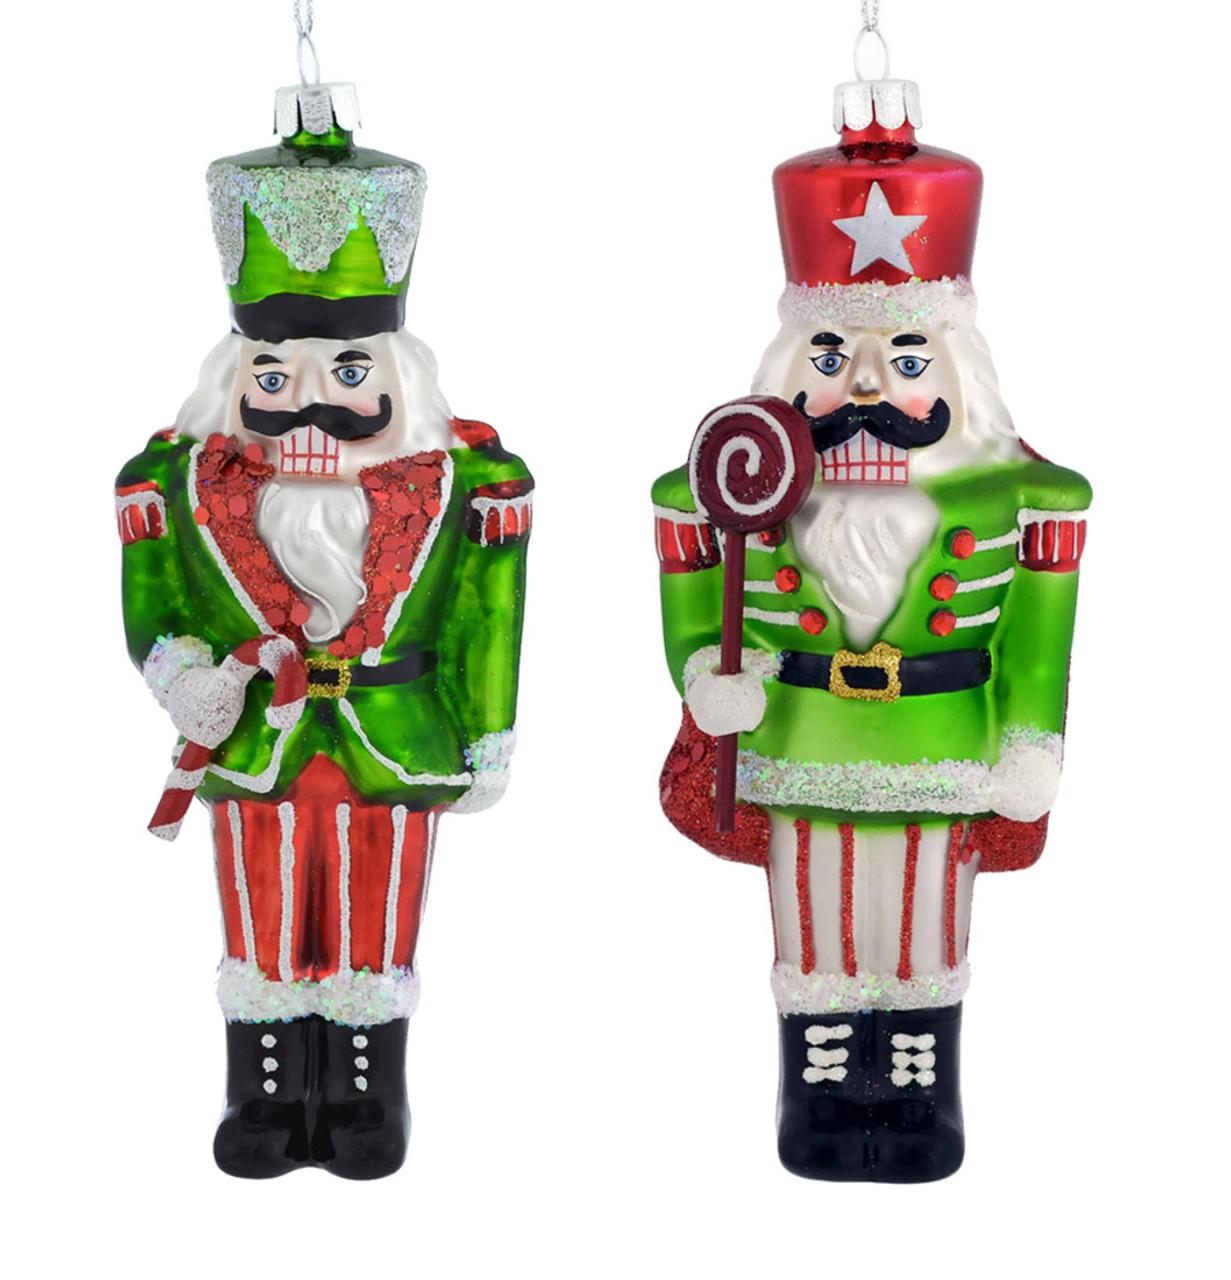 Candy Nutcracker Glass Ornament 6 5 8 Ra3852918